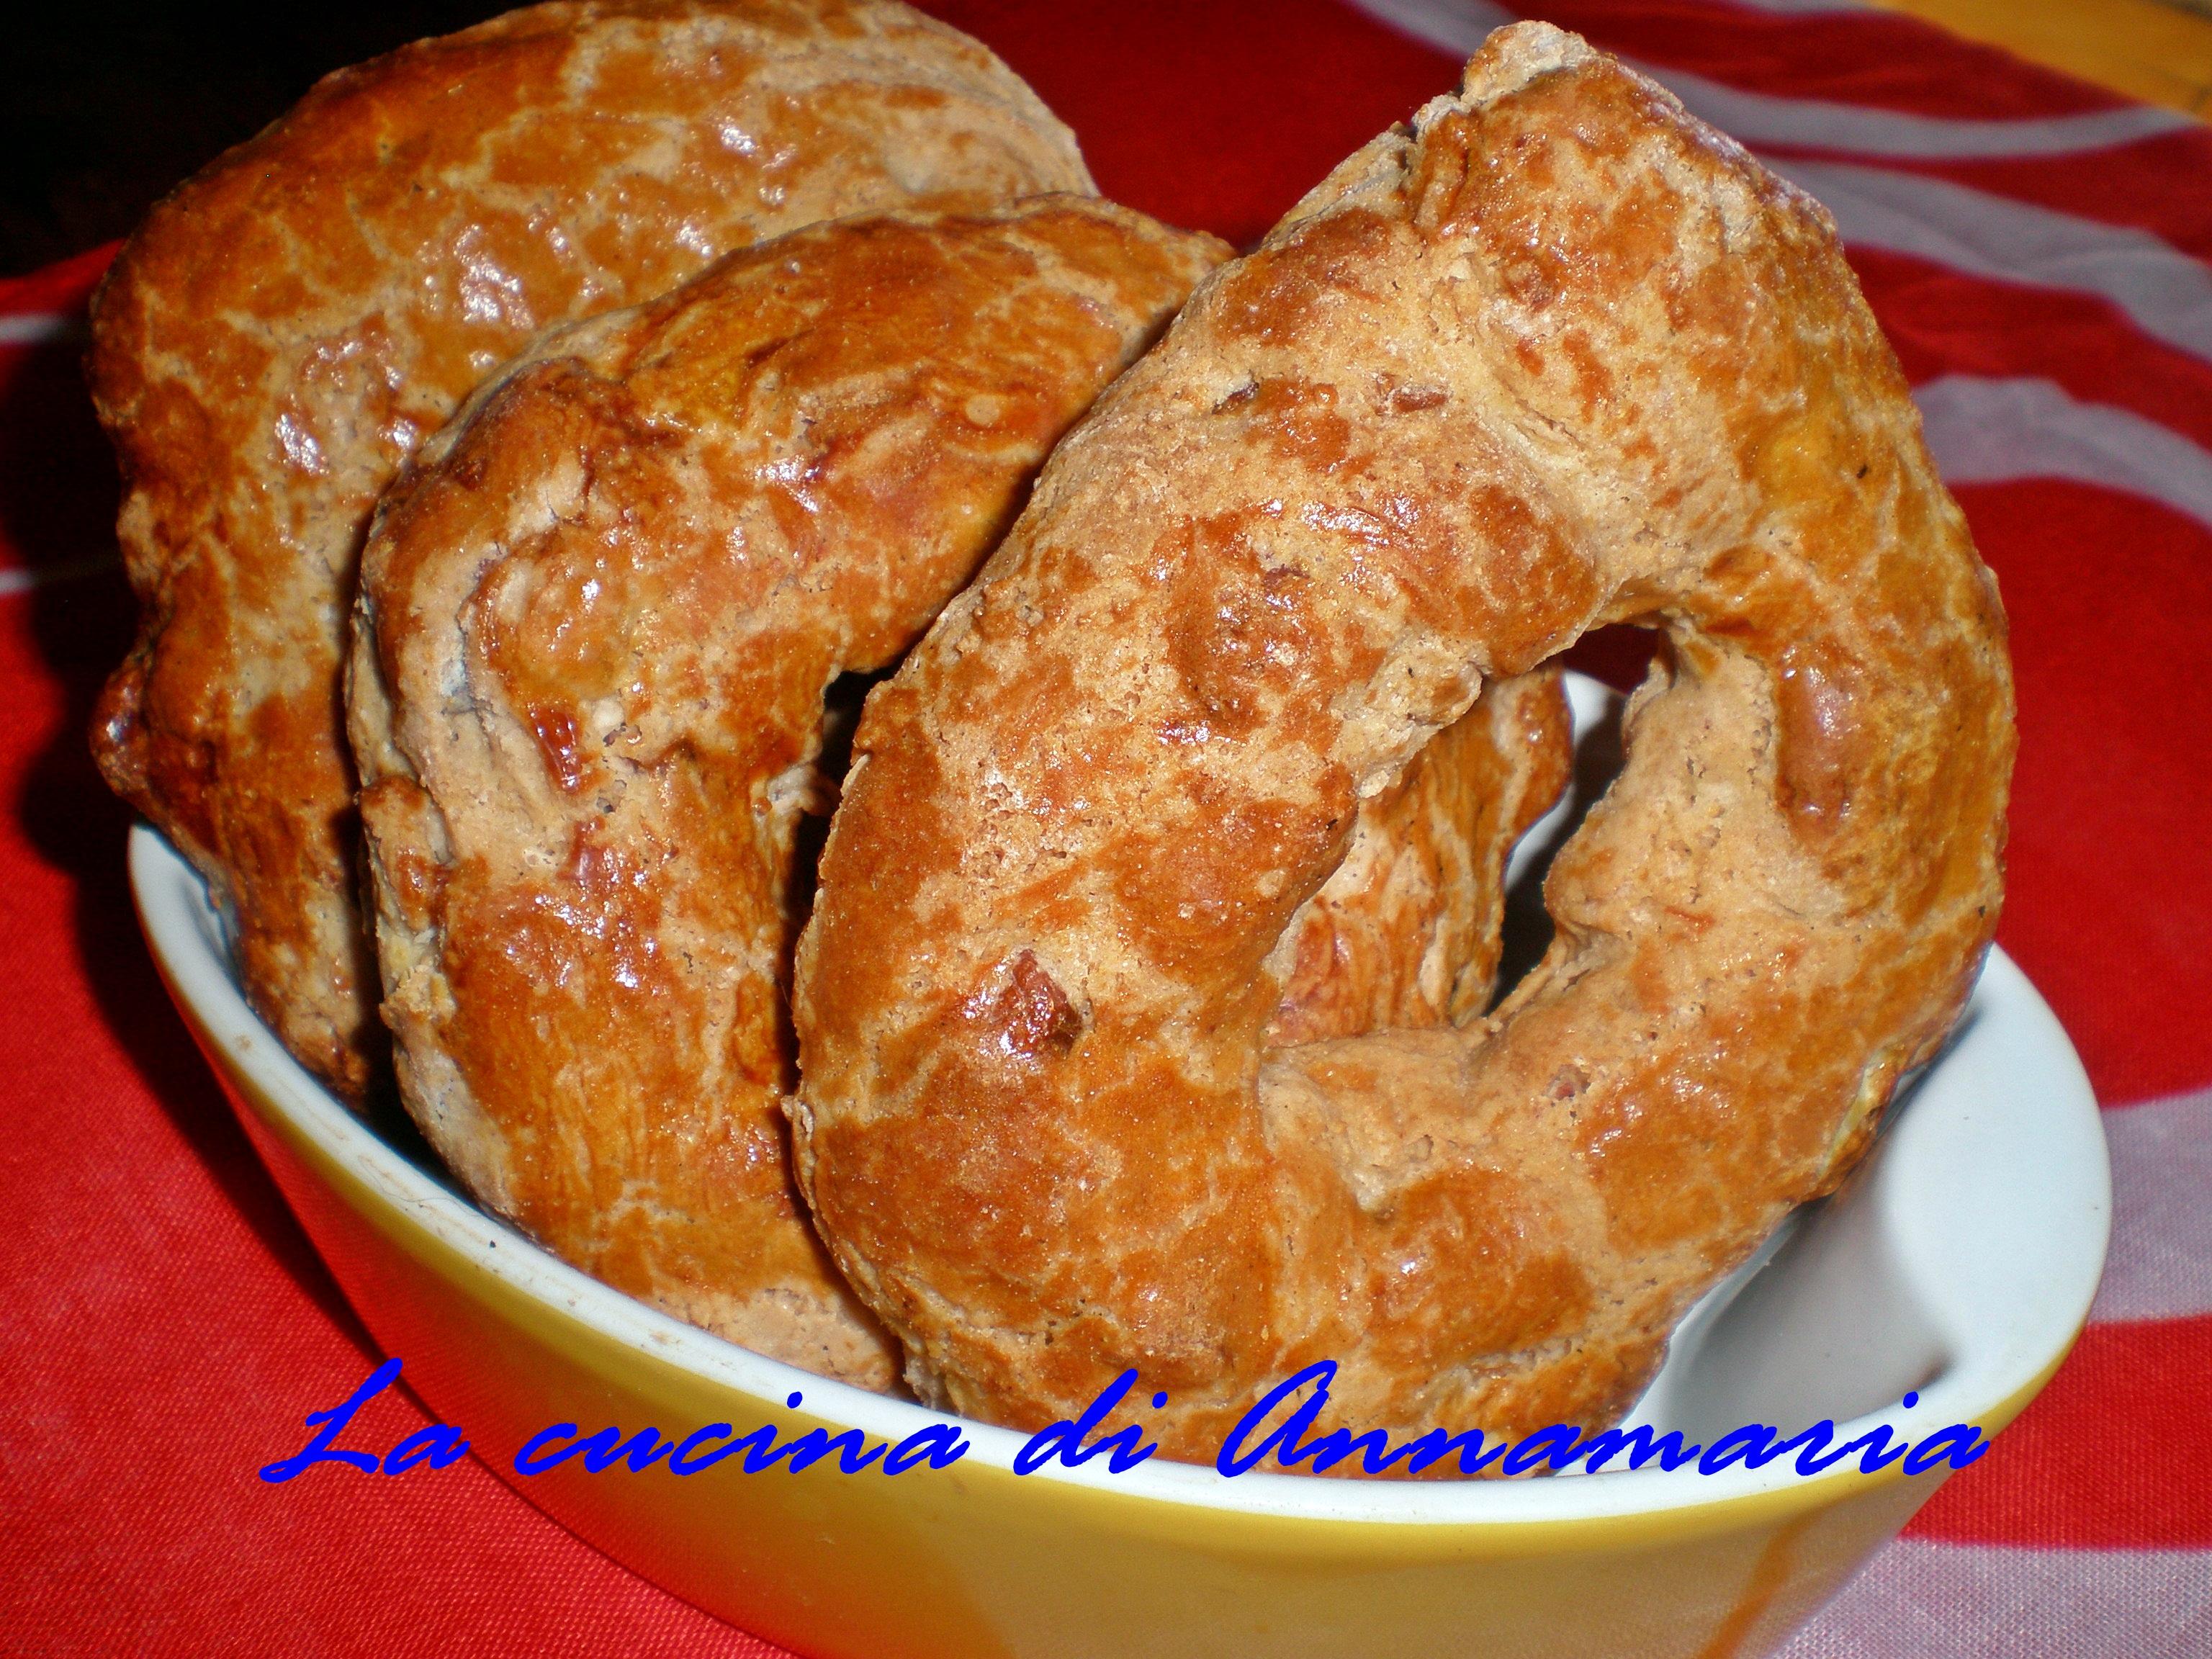 roccoco ricetta di Natale  lacucinadiannamaria